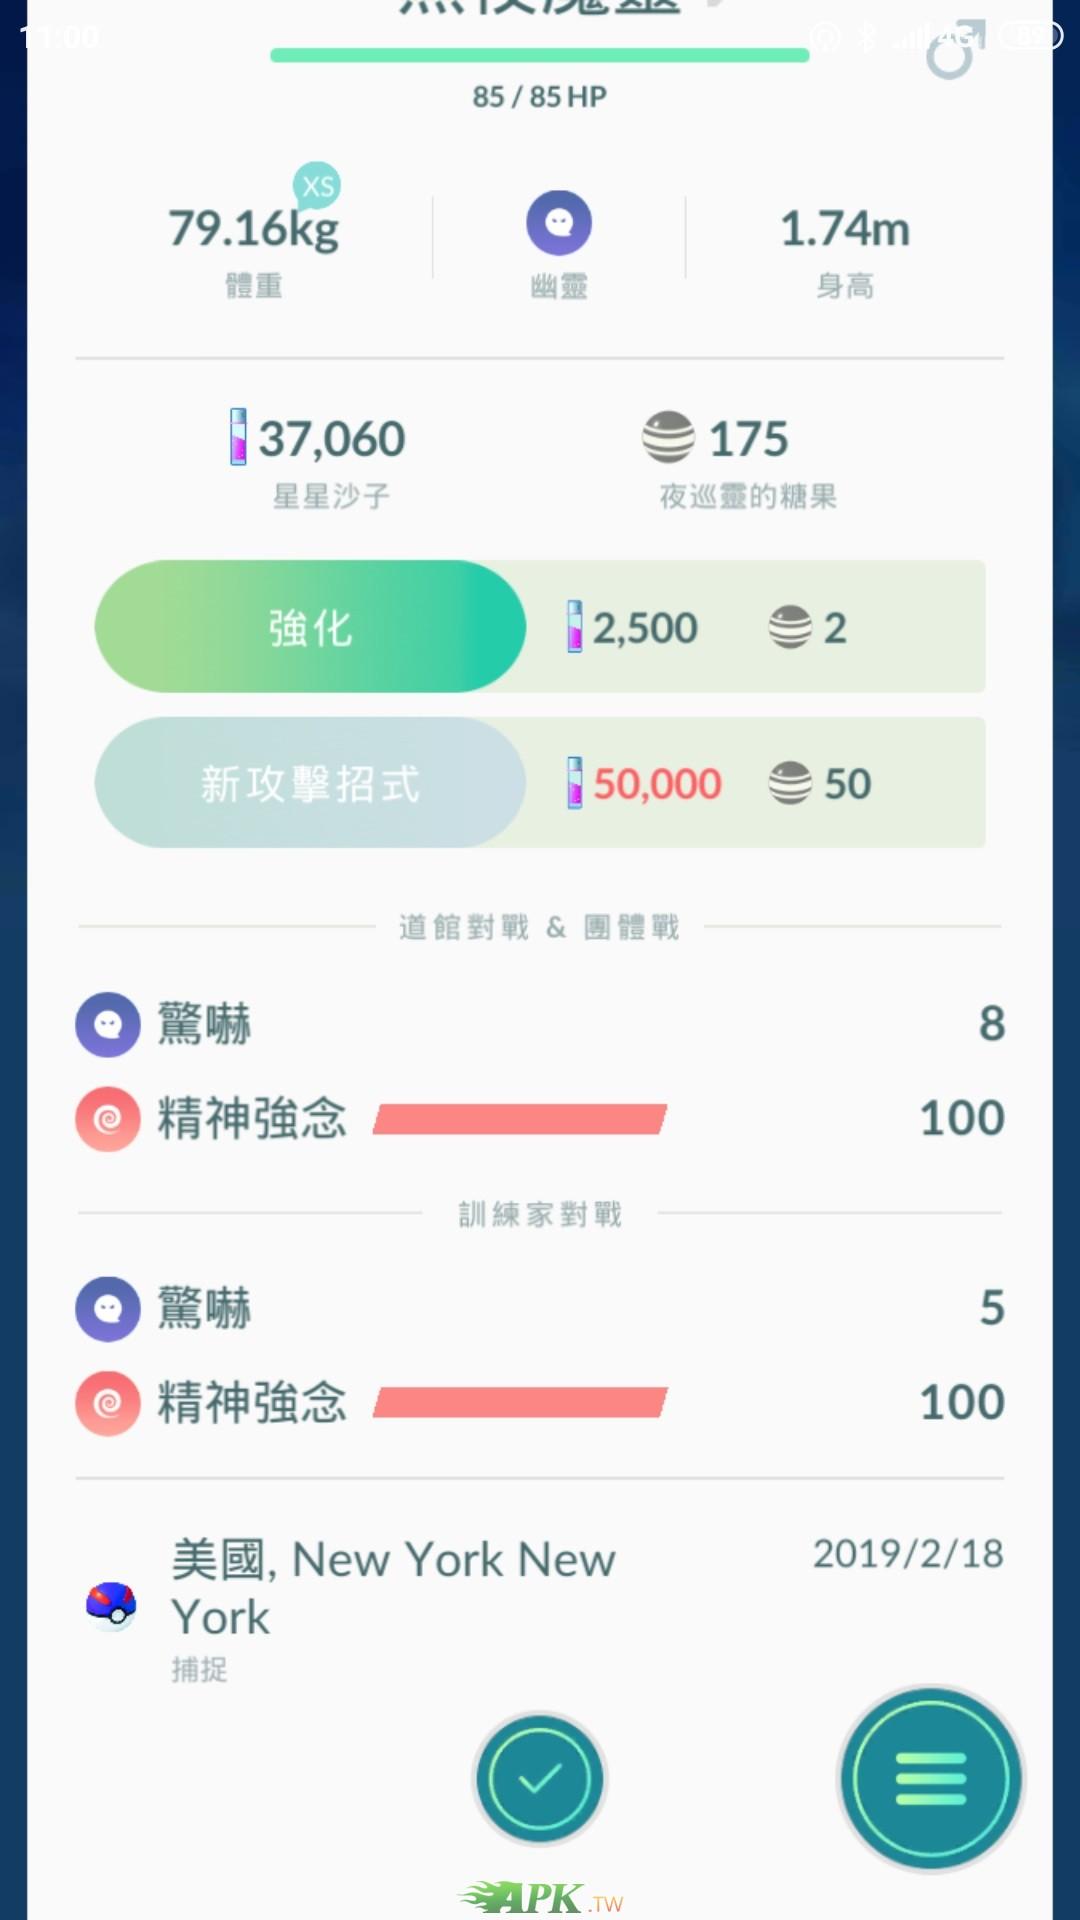 Screenshot_2019-02-18-11-00-05-560_com.nianticlabs.pokemongo.jpg